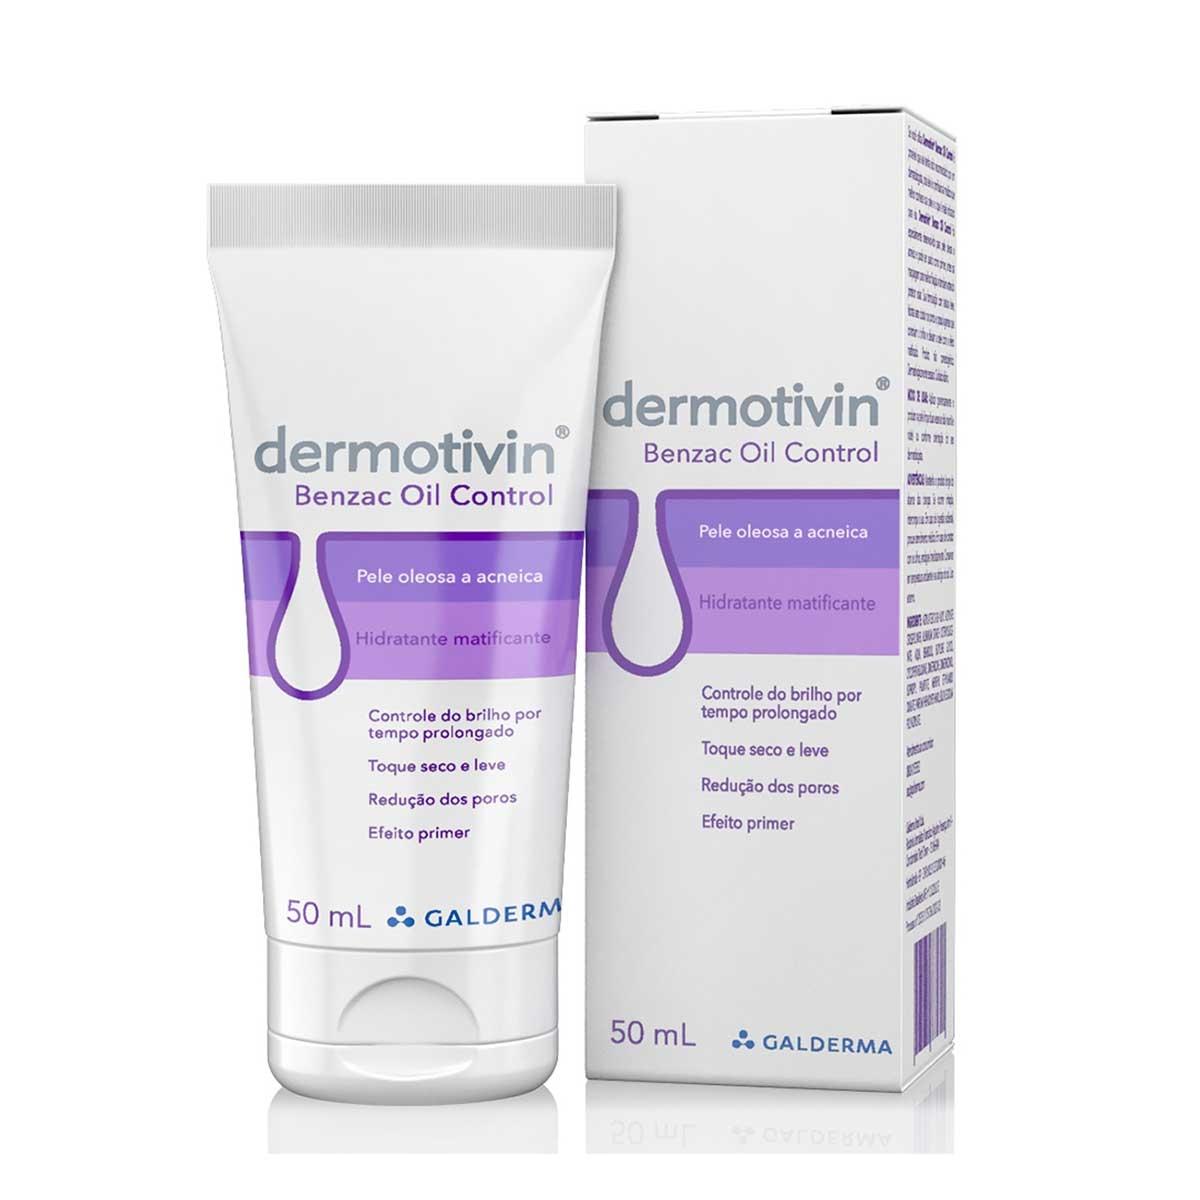 Hidratante Matificante Dermotivin Benzac Oil Control Pele Oleosa e Acneica com 50ml 50ml